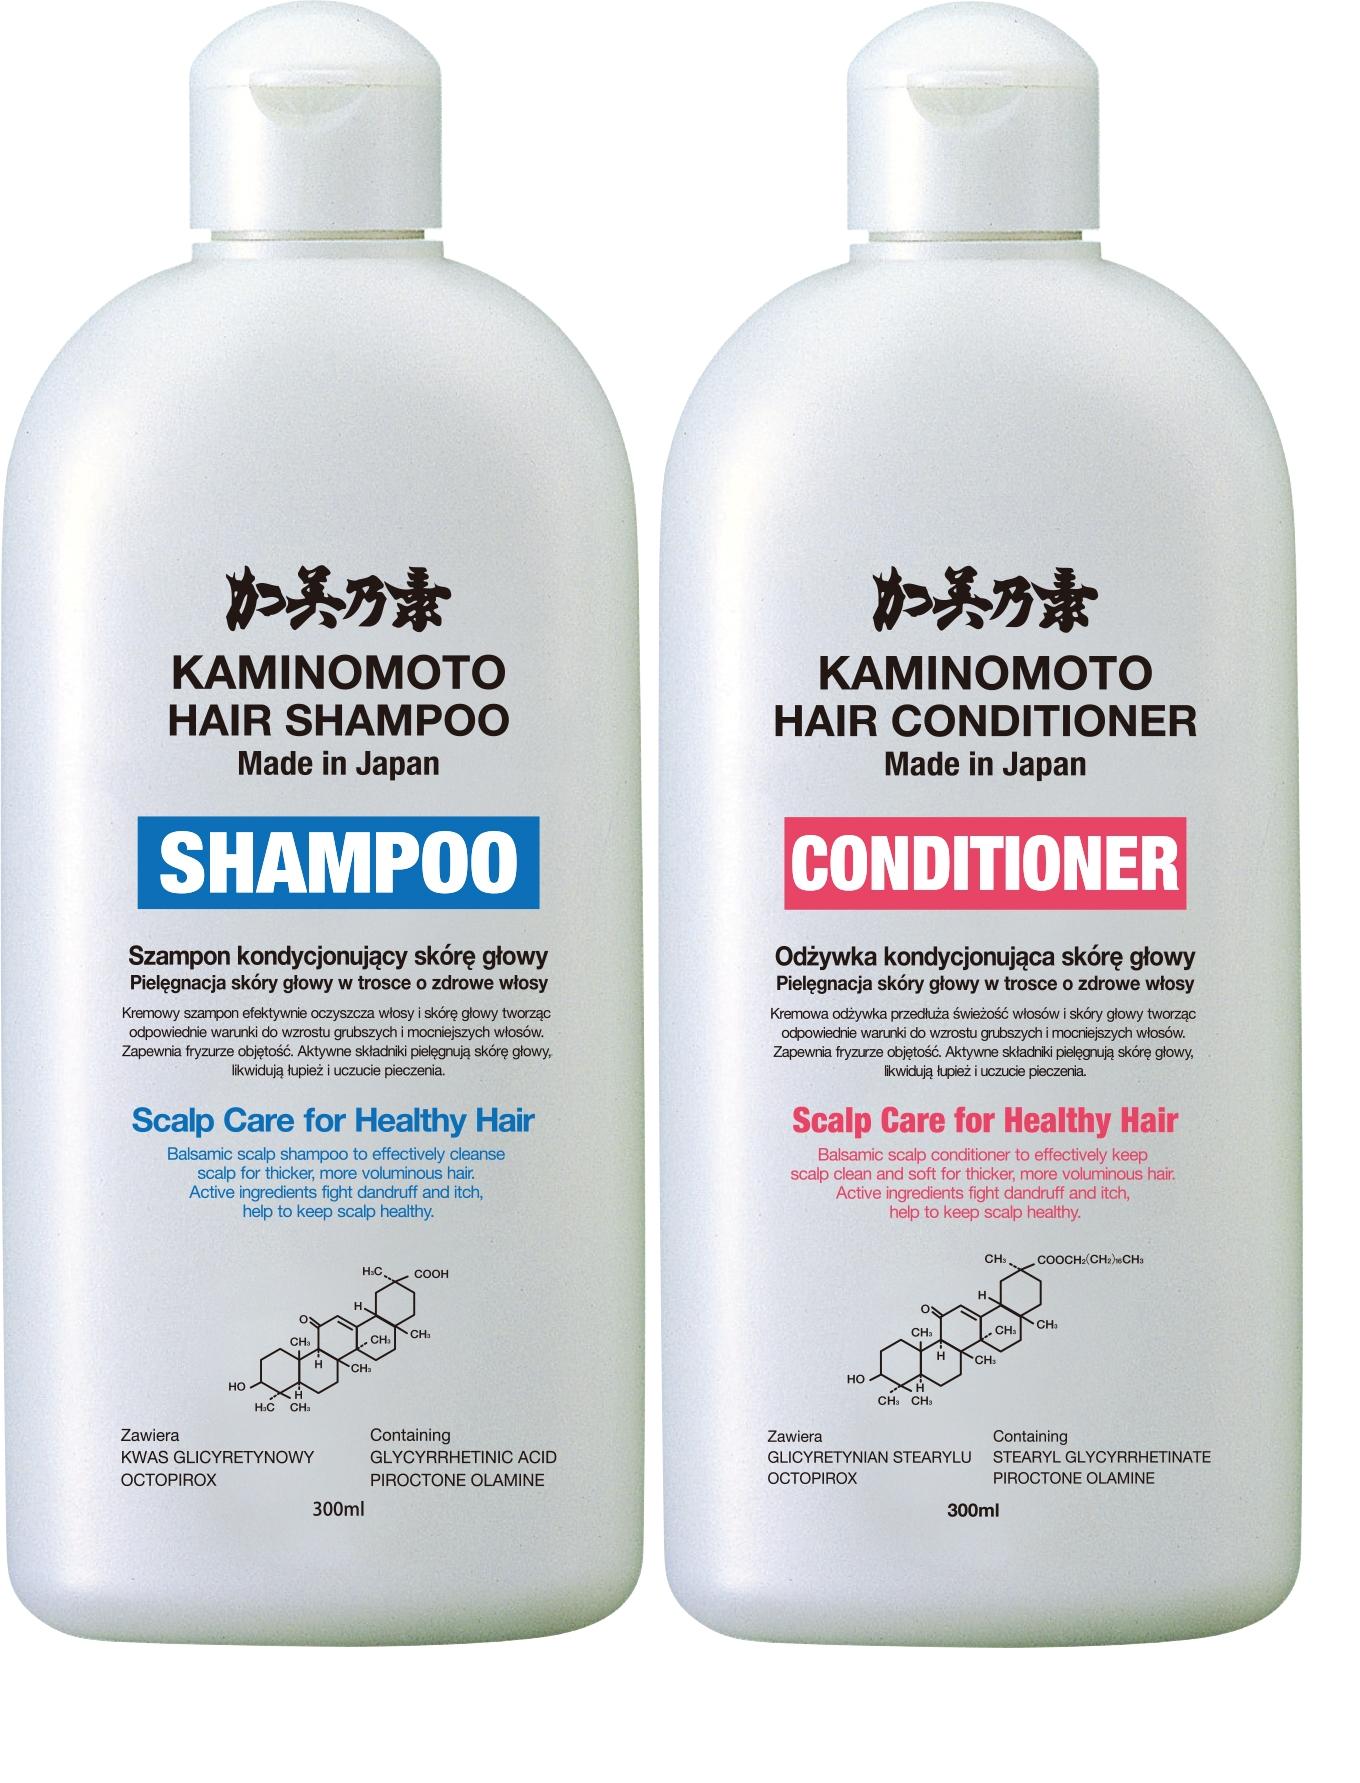 Kaminomoto Zestaw Szampon Odywka Sachi Oryginalne Koreaskie Hair Tonic I